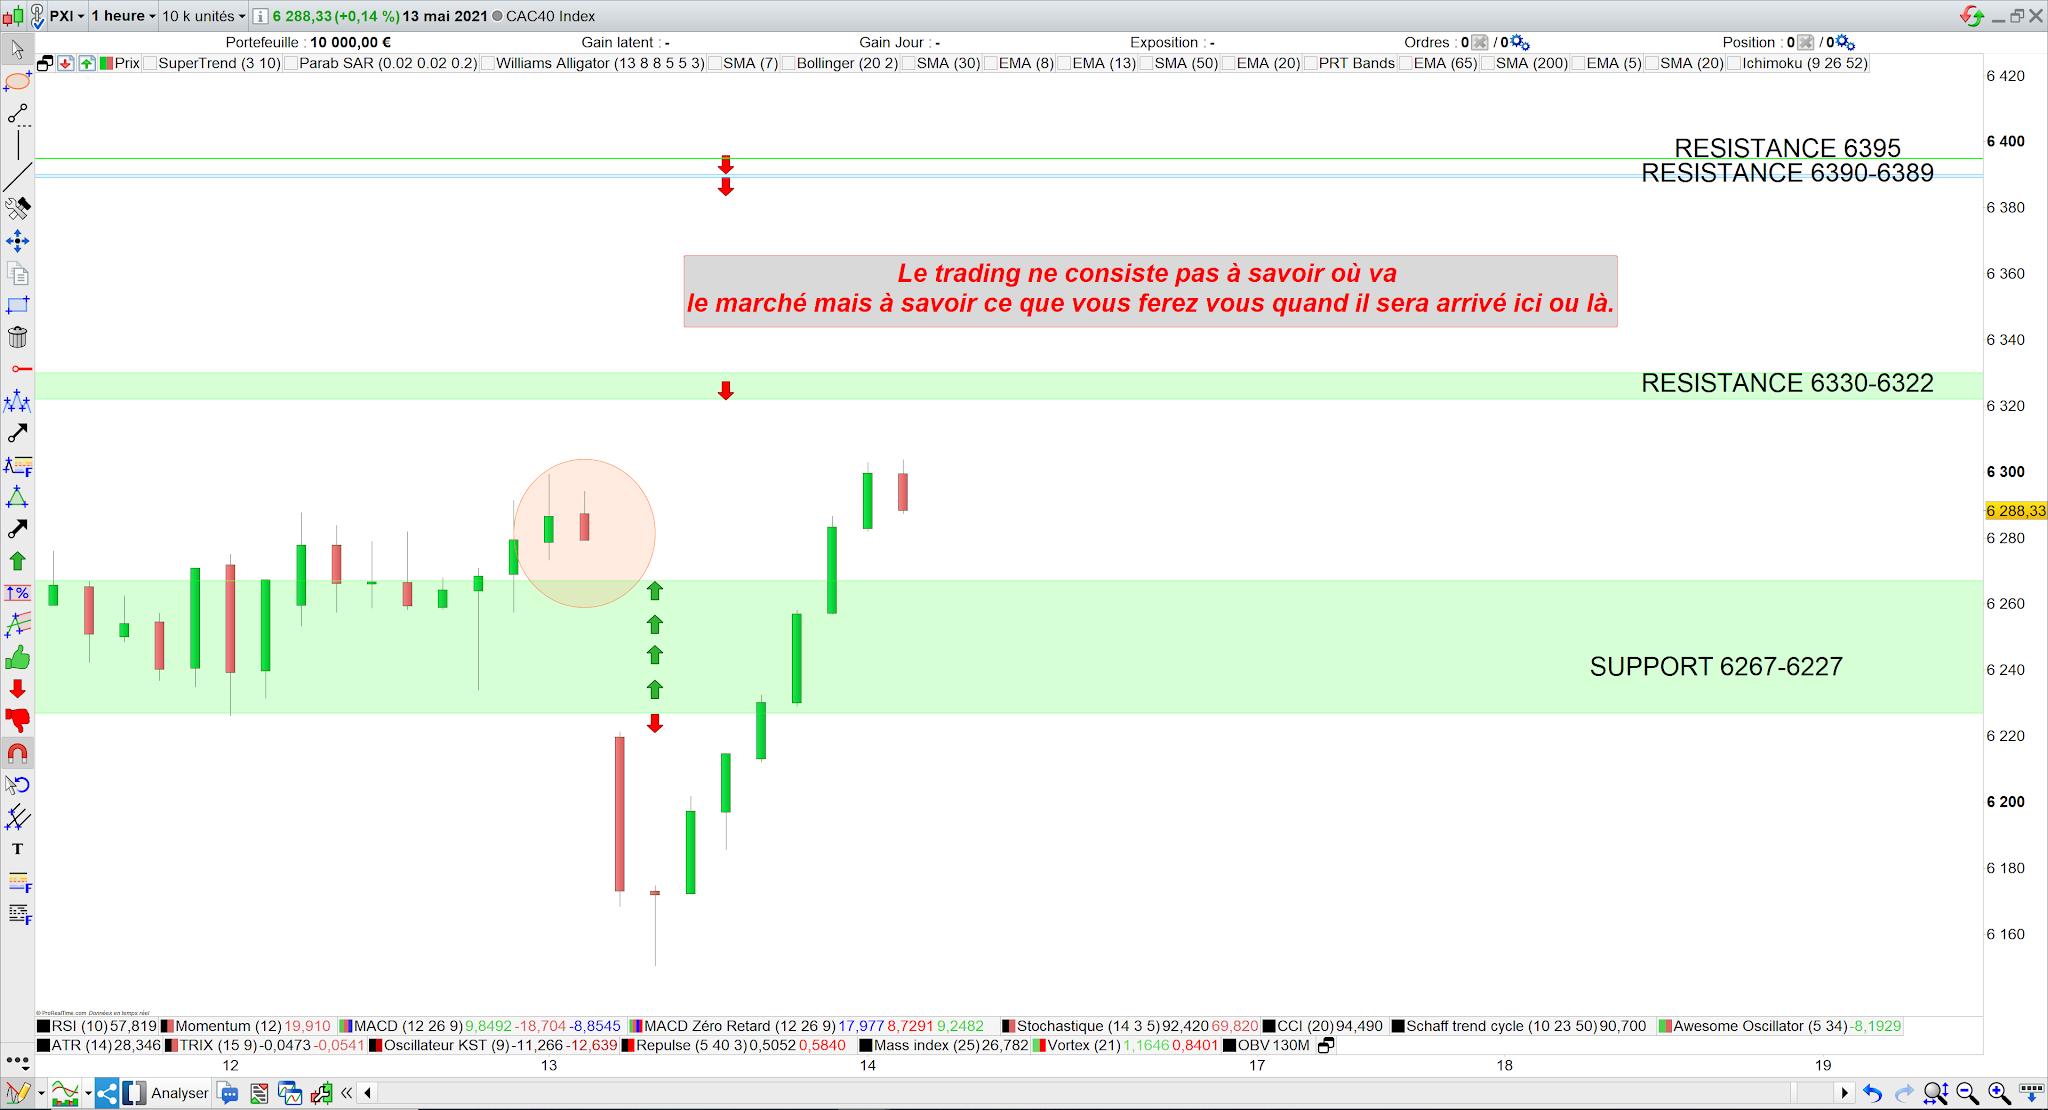 Bilan trading cac40 13 mai 21